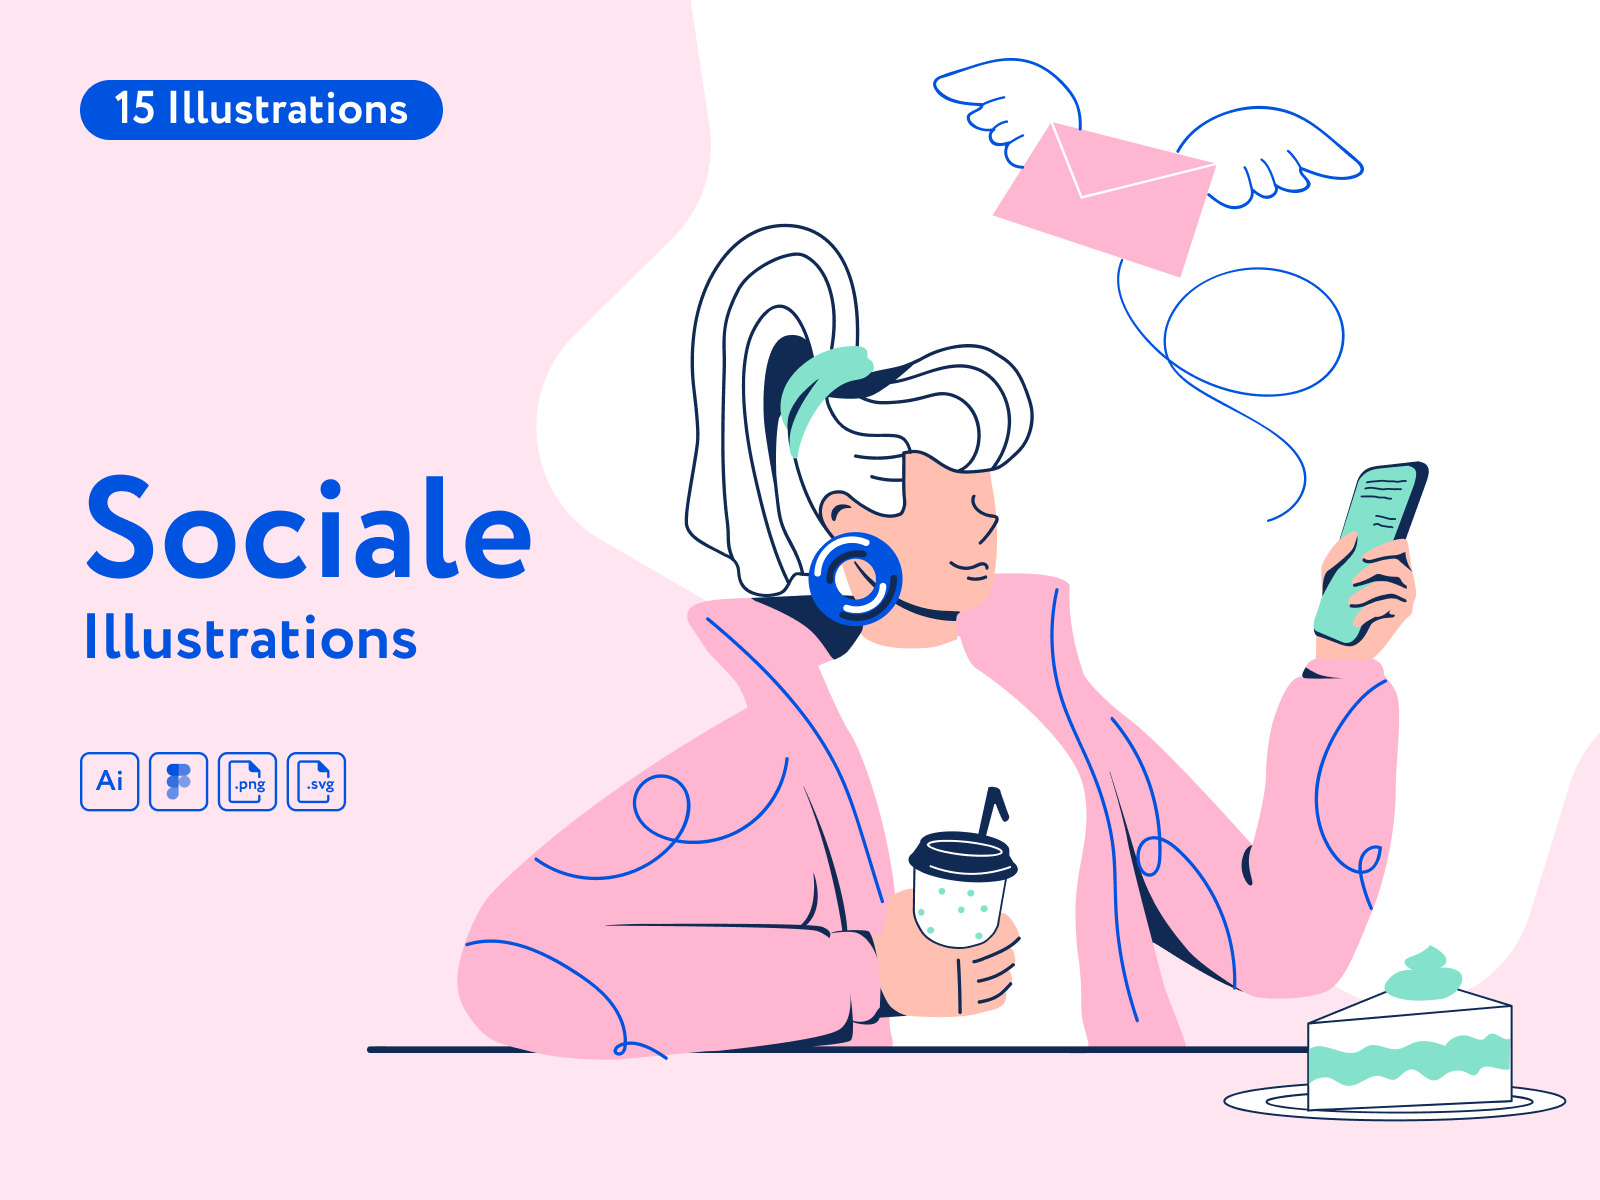 Sociale Illustrations